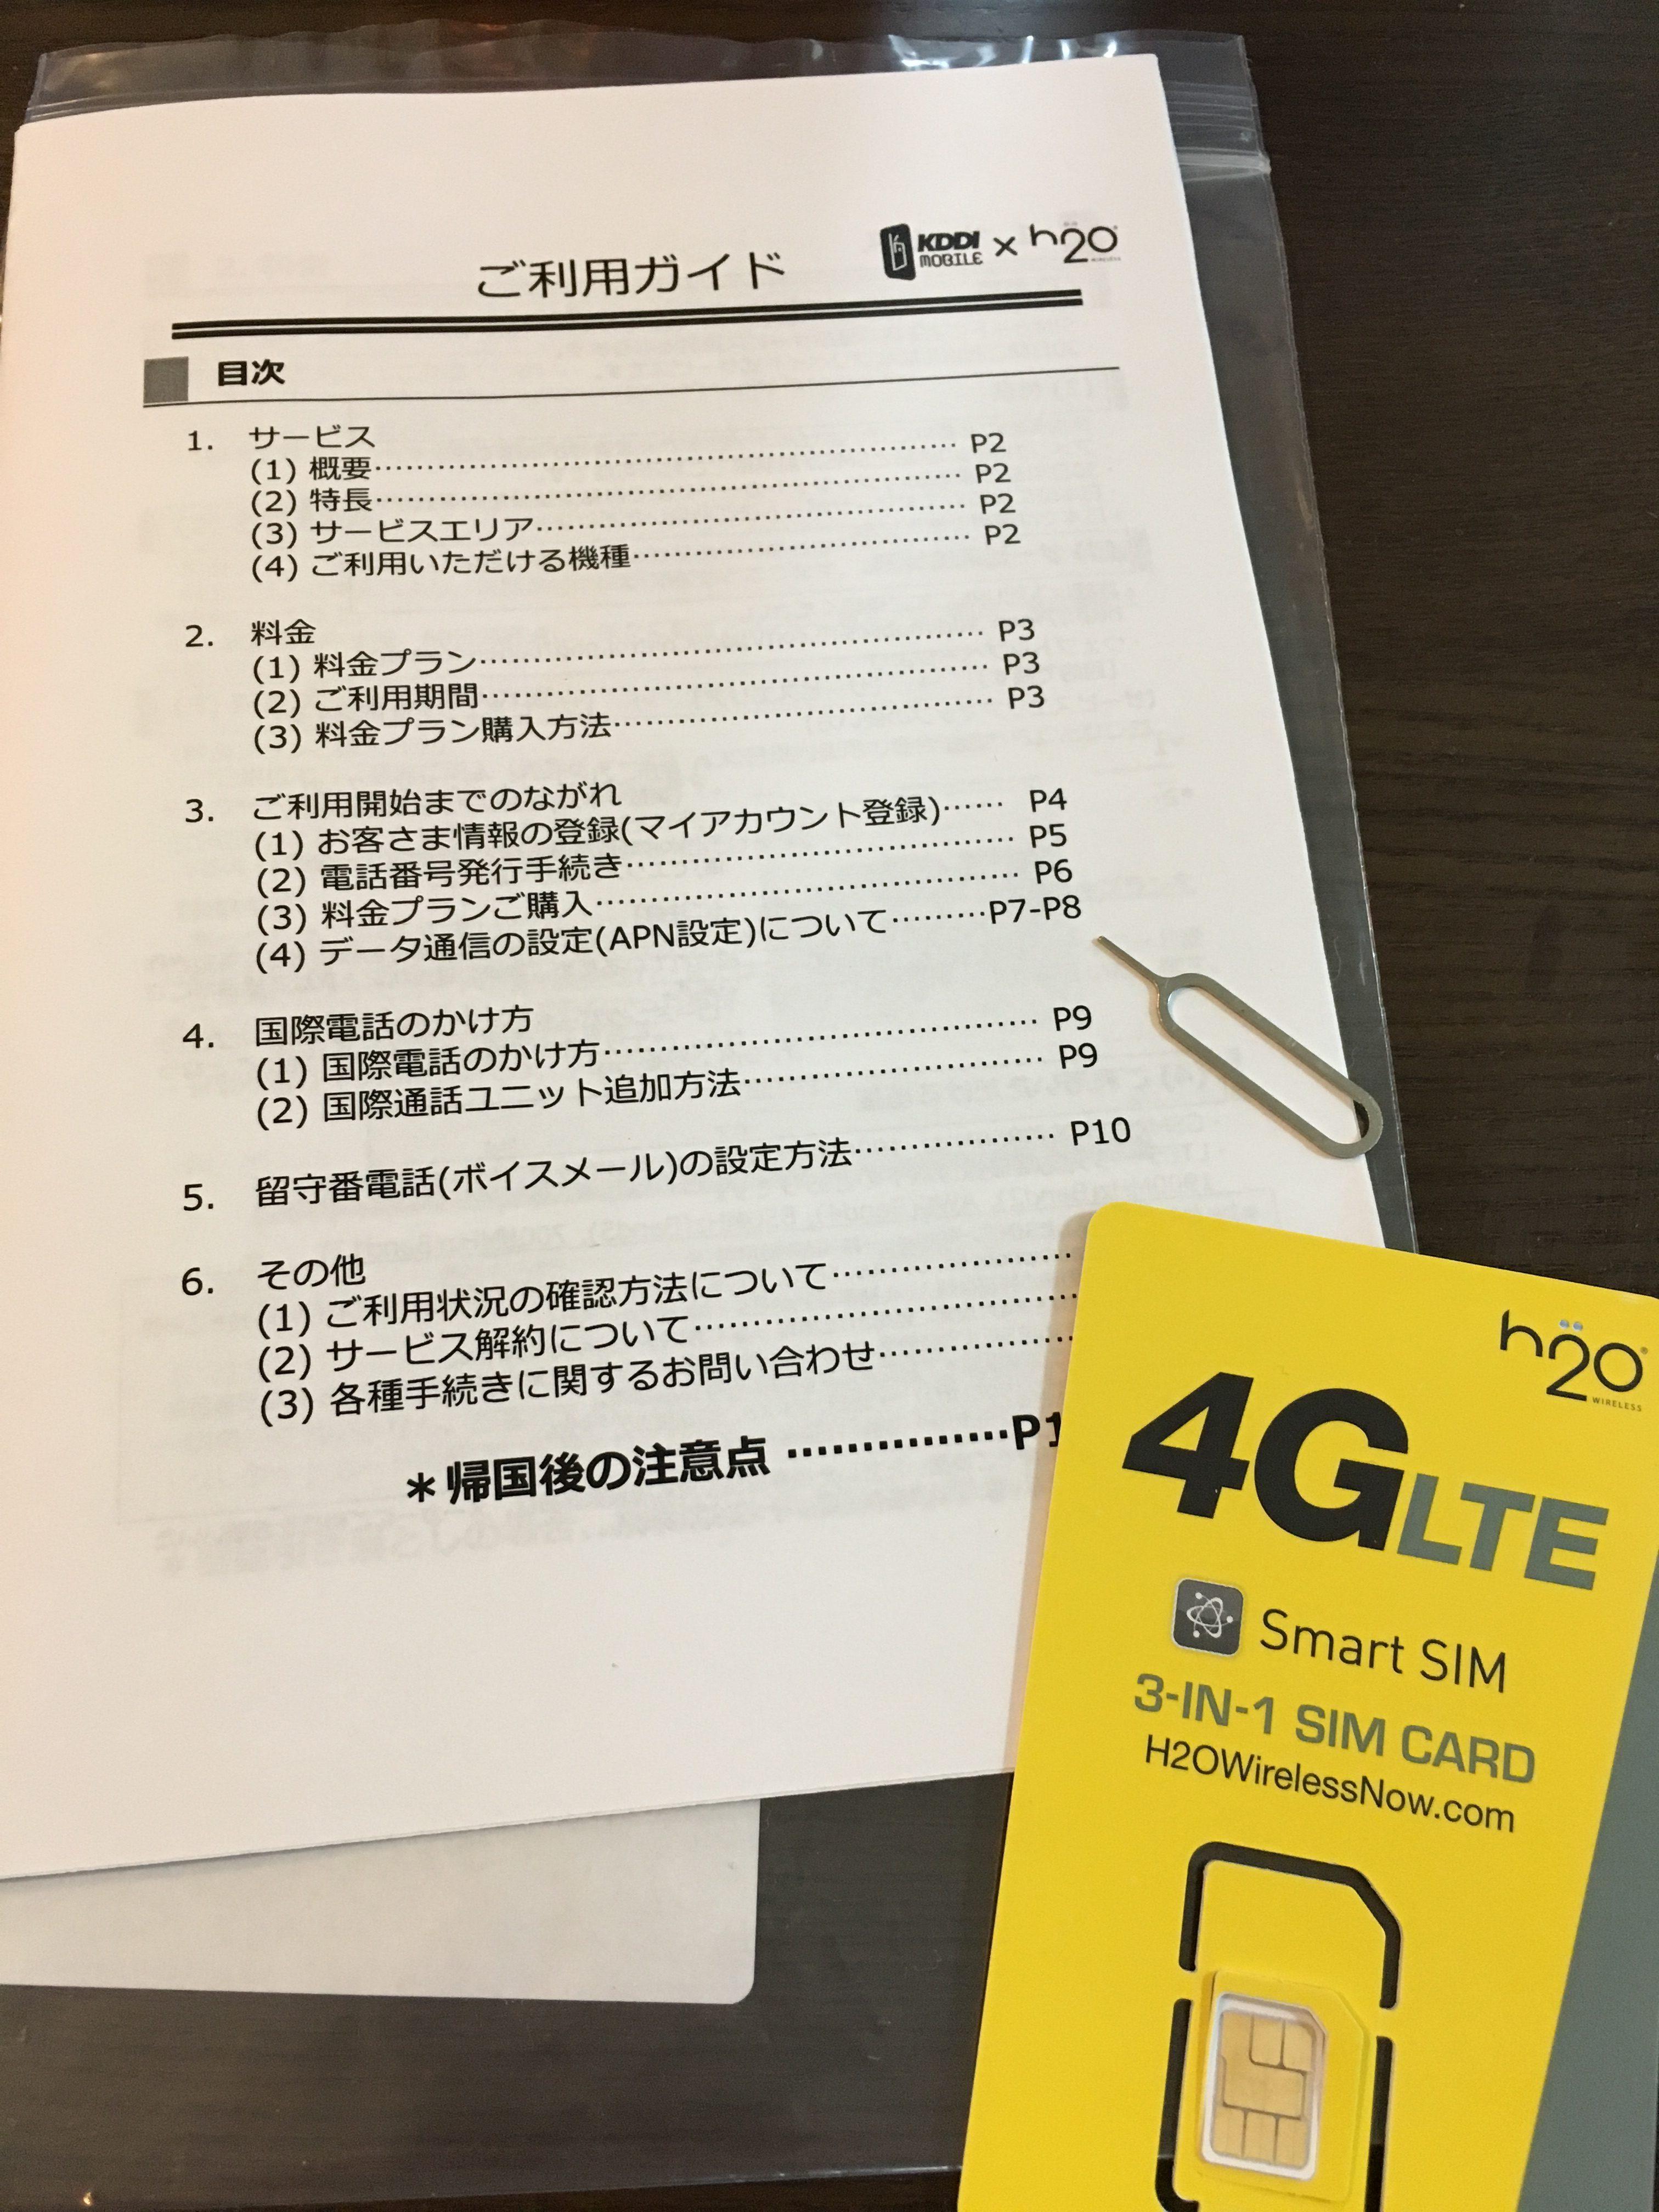 KDDI Mobile H2O設定方法 iphone編【2018年度版】